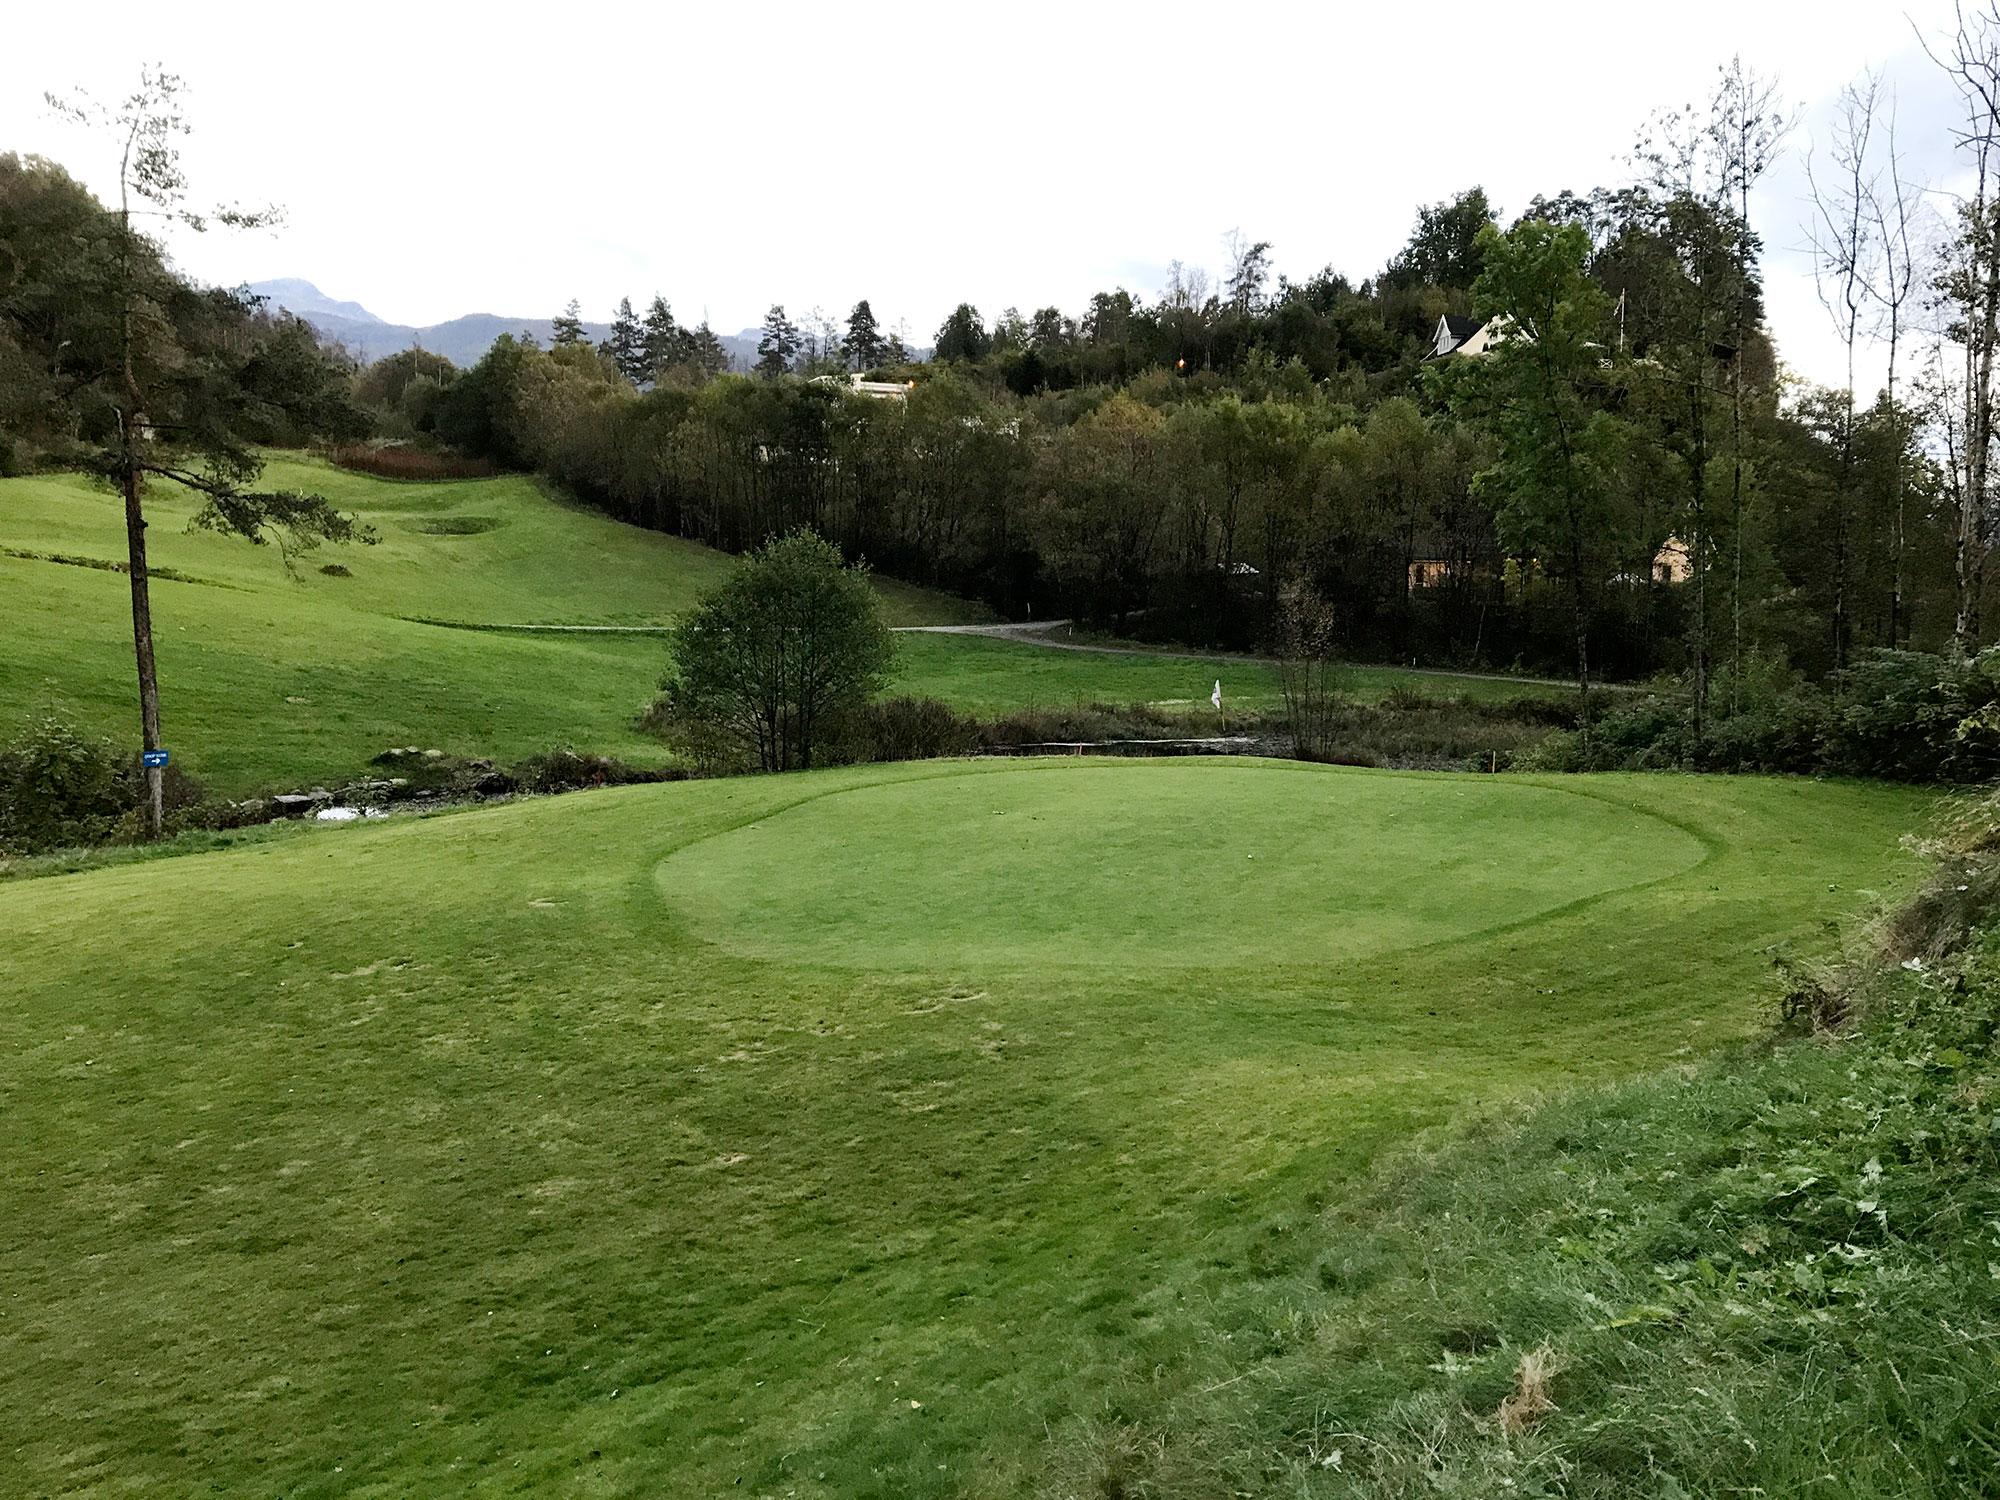 Sauda golfbane hull 9 green